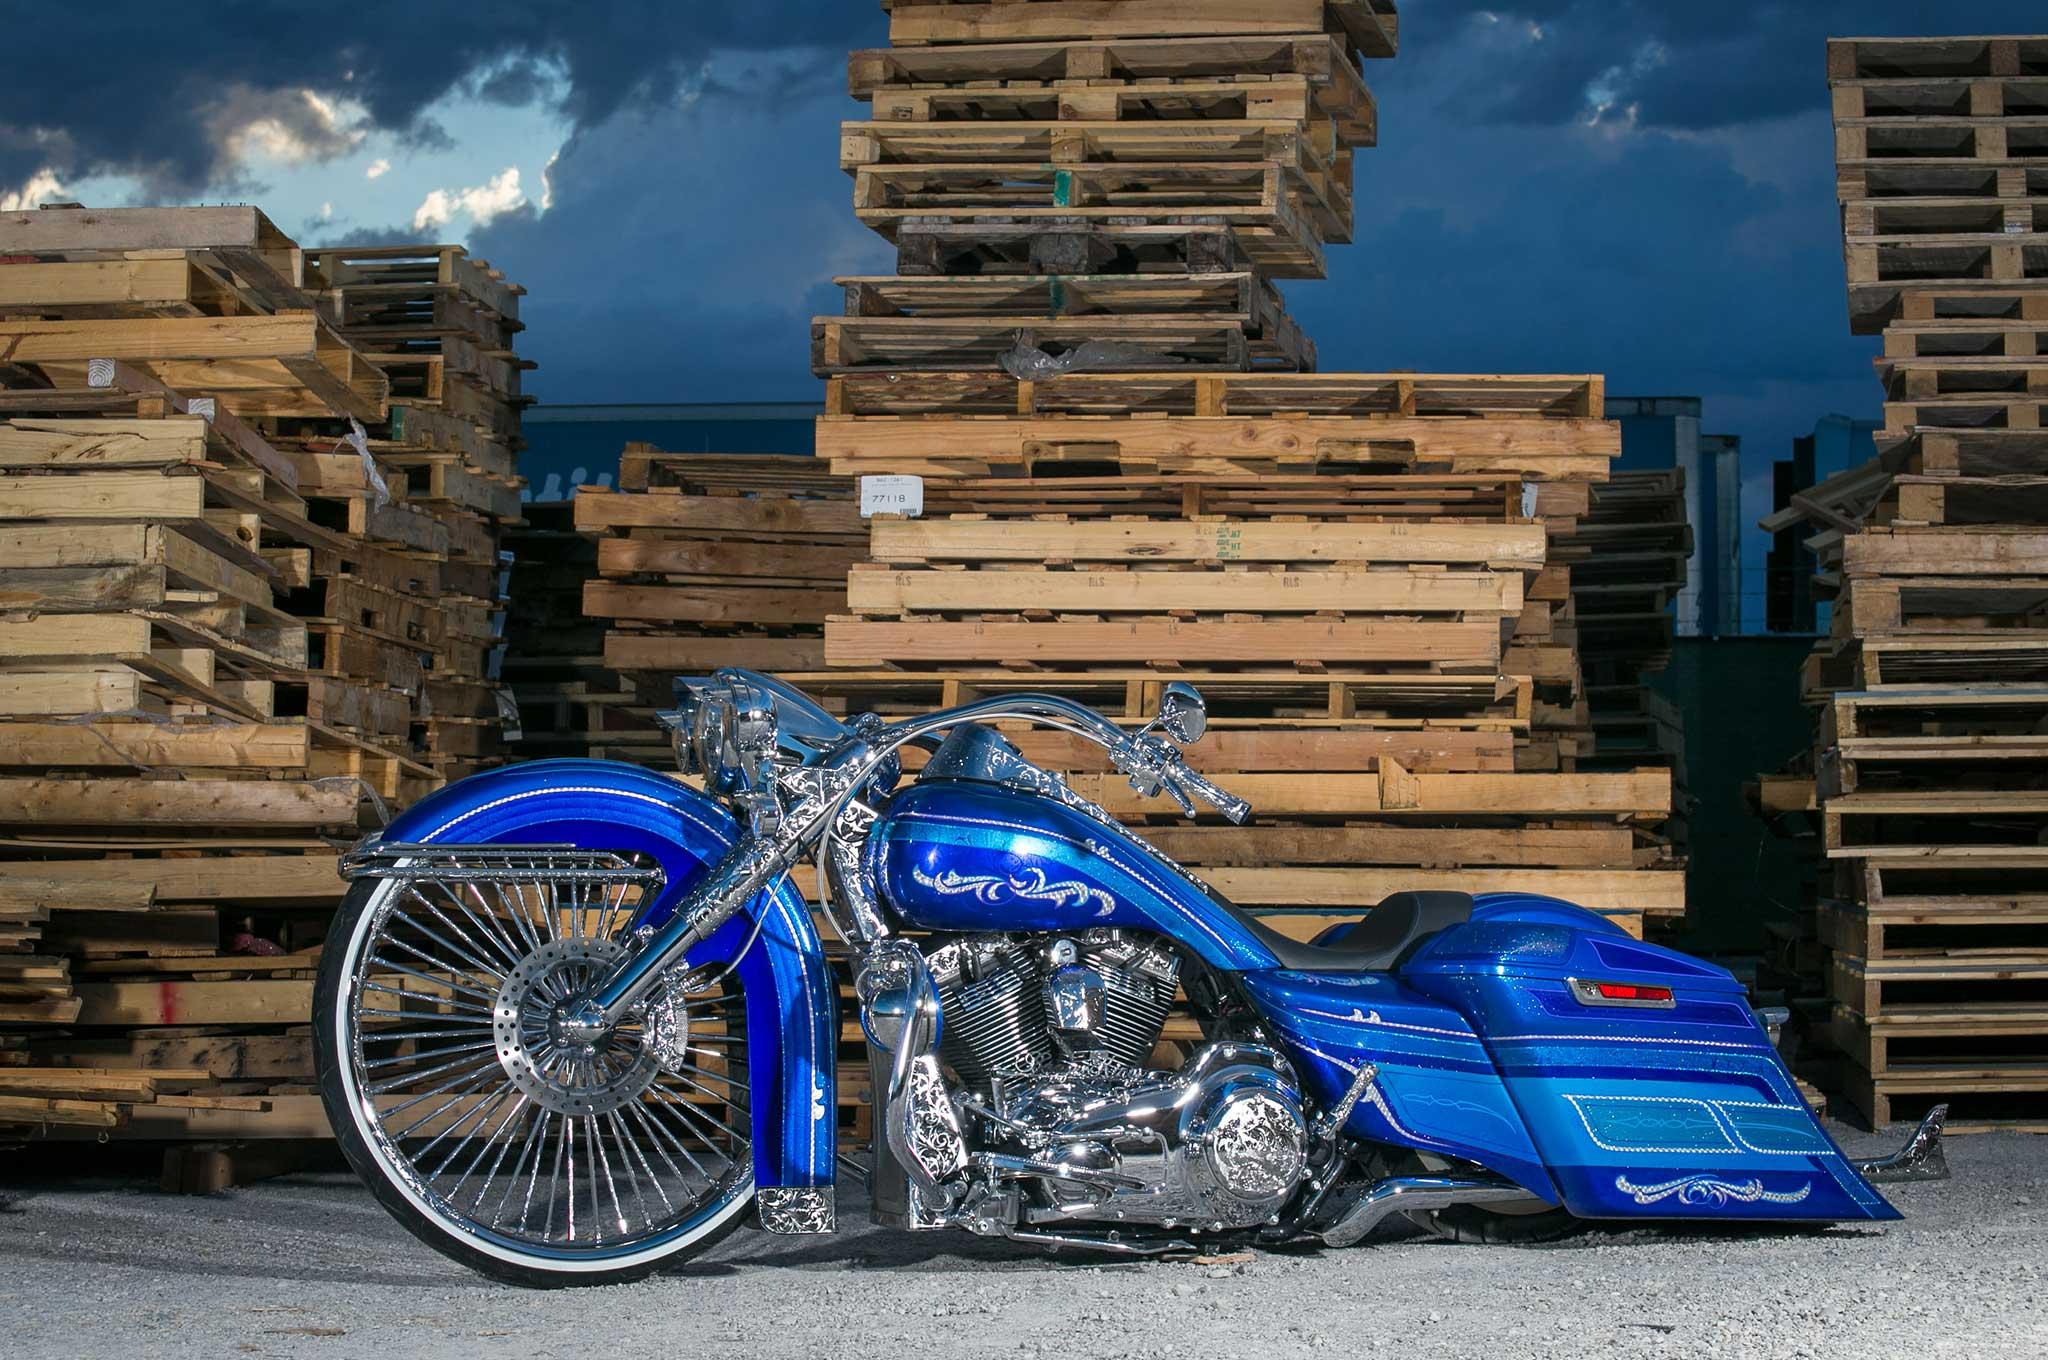 2014 Harley Davidson Road King Show Winner